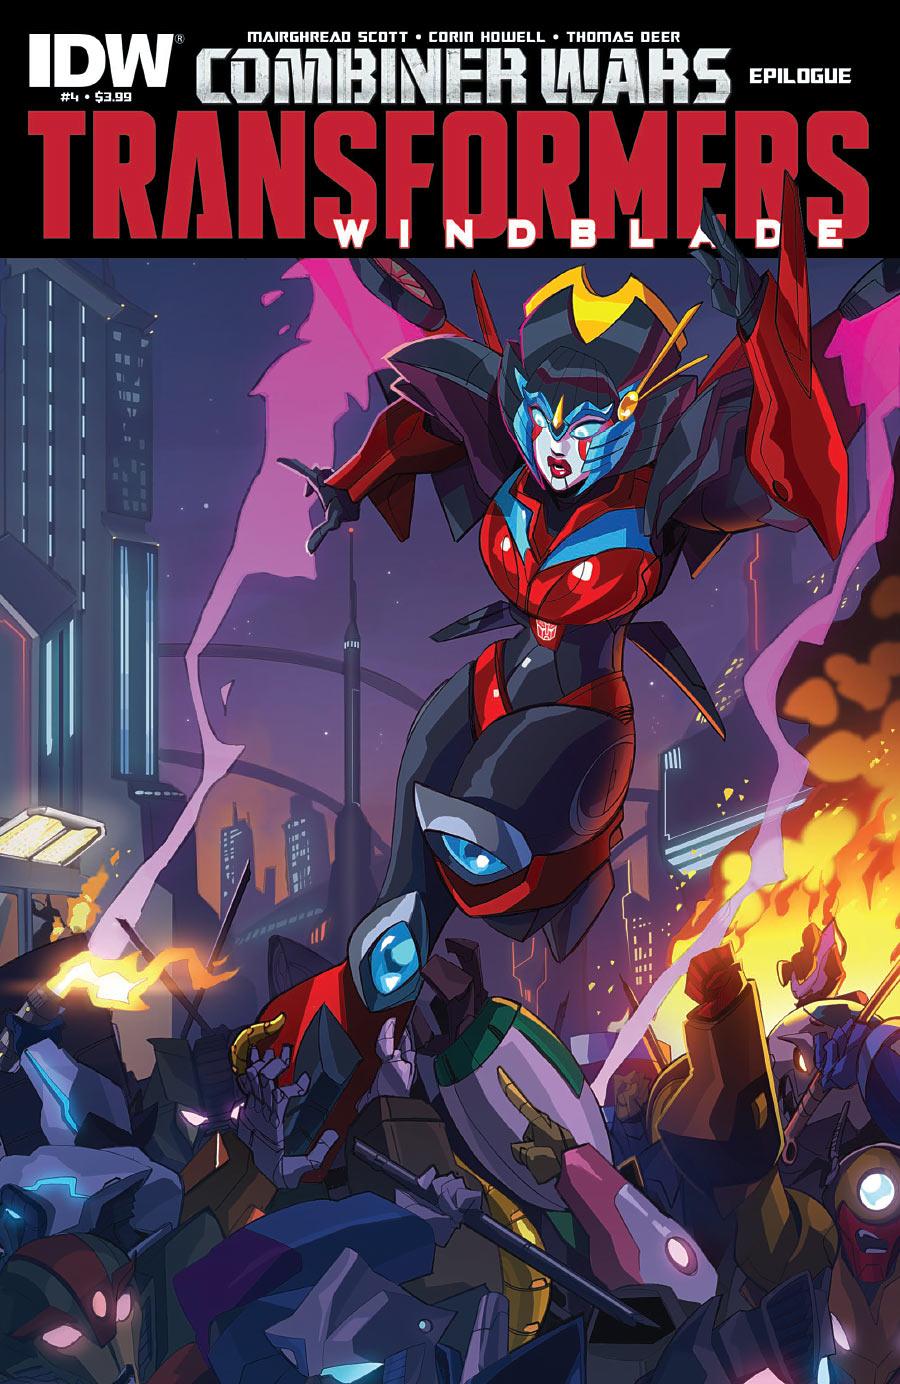 The Transformers: Windblade #4